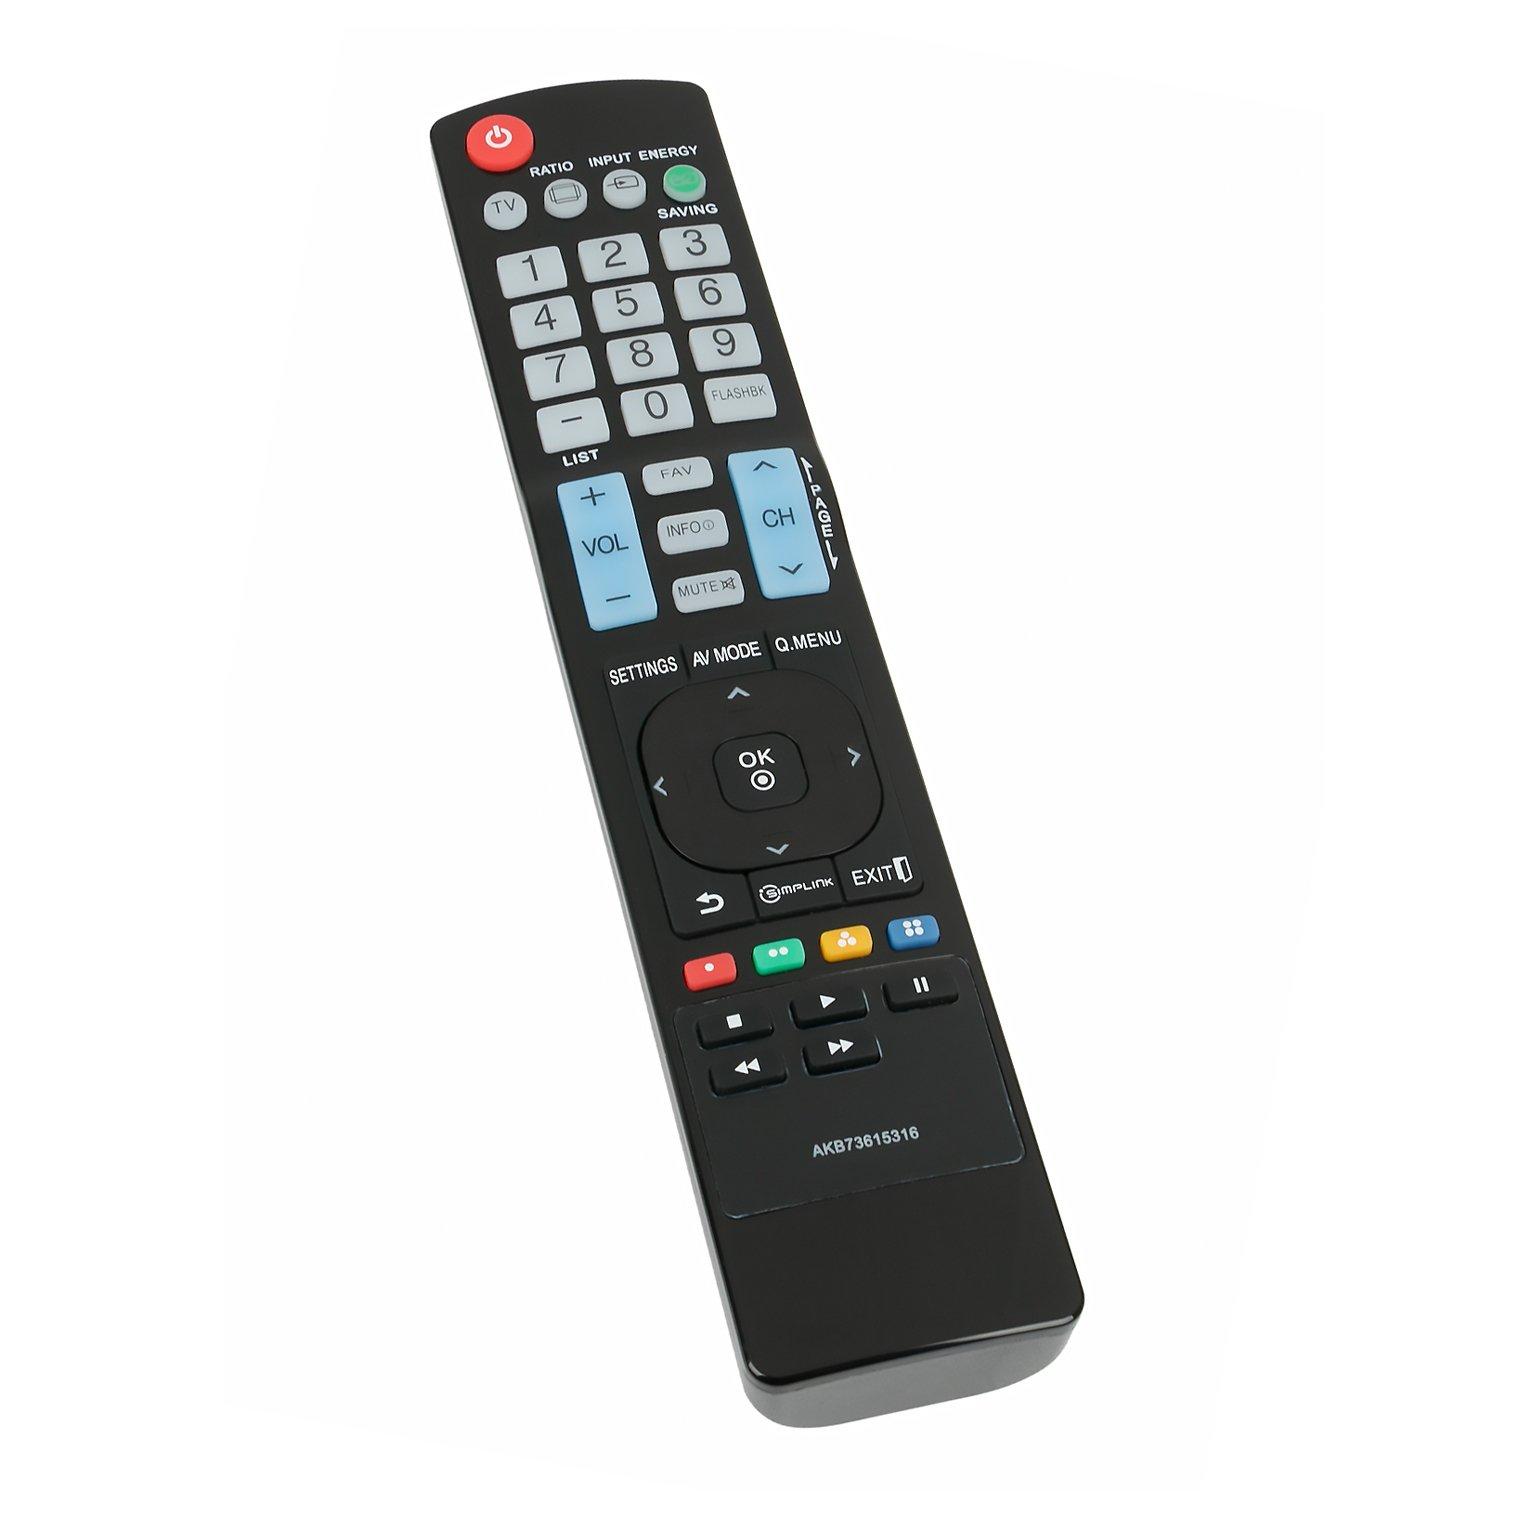 Control Remoto AKB73615316 LG Plasma TV 32LS5600 37LS5600...